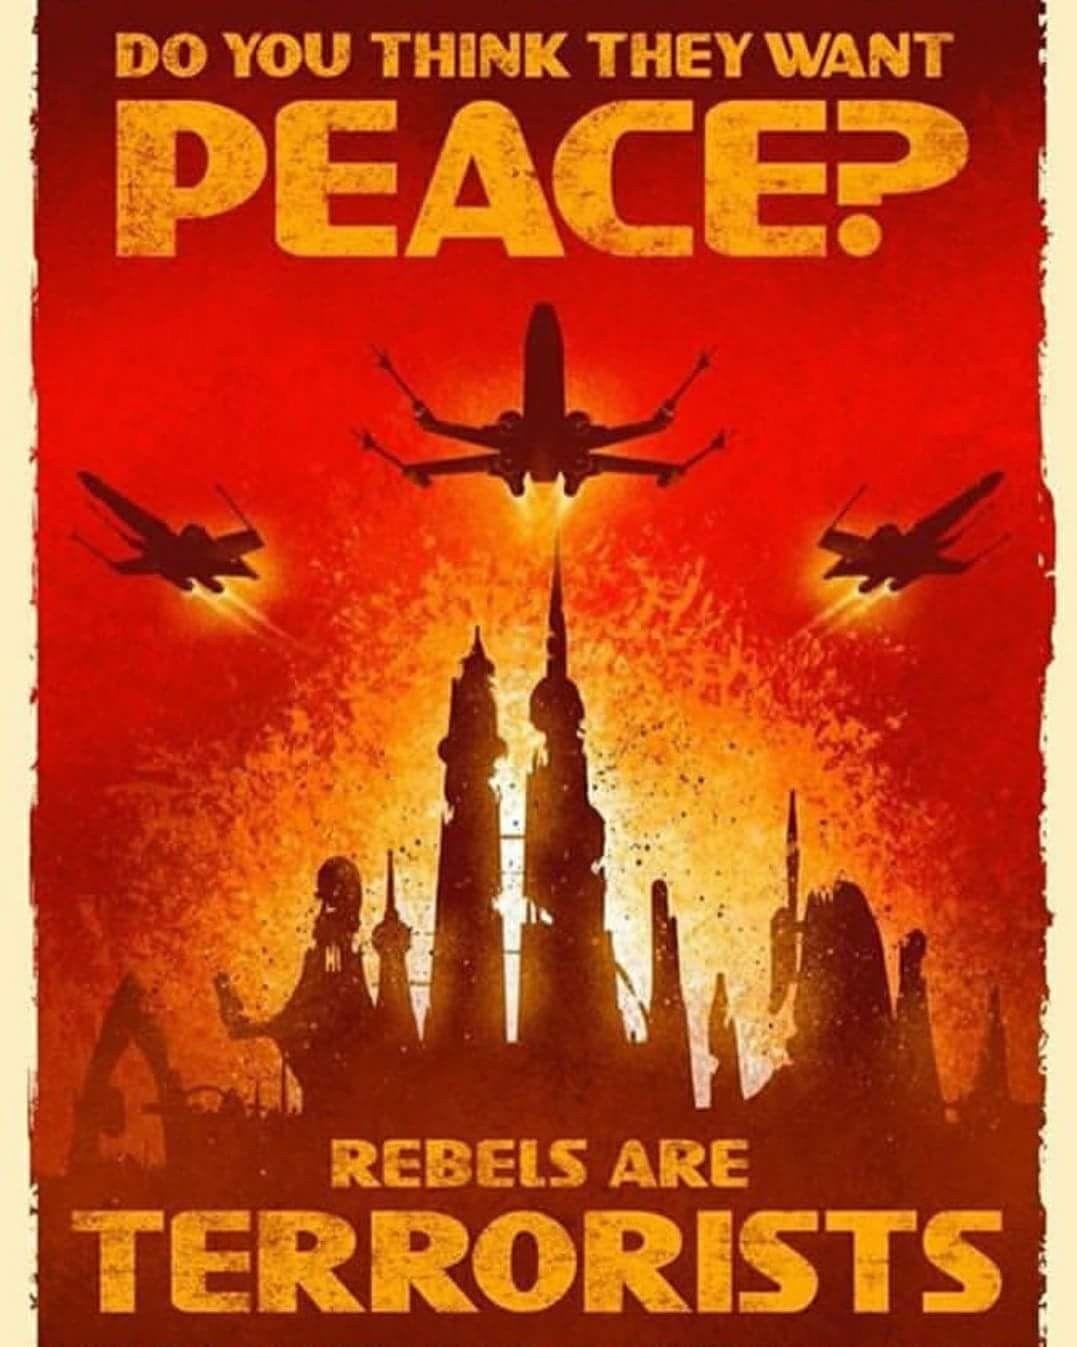 Imperial Propaganda Star Wars Poster Star Wars Wallpaper Star Wars Art